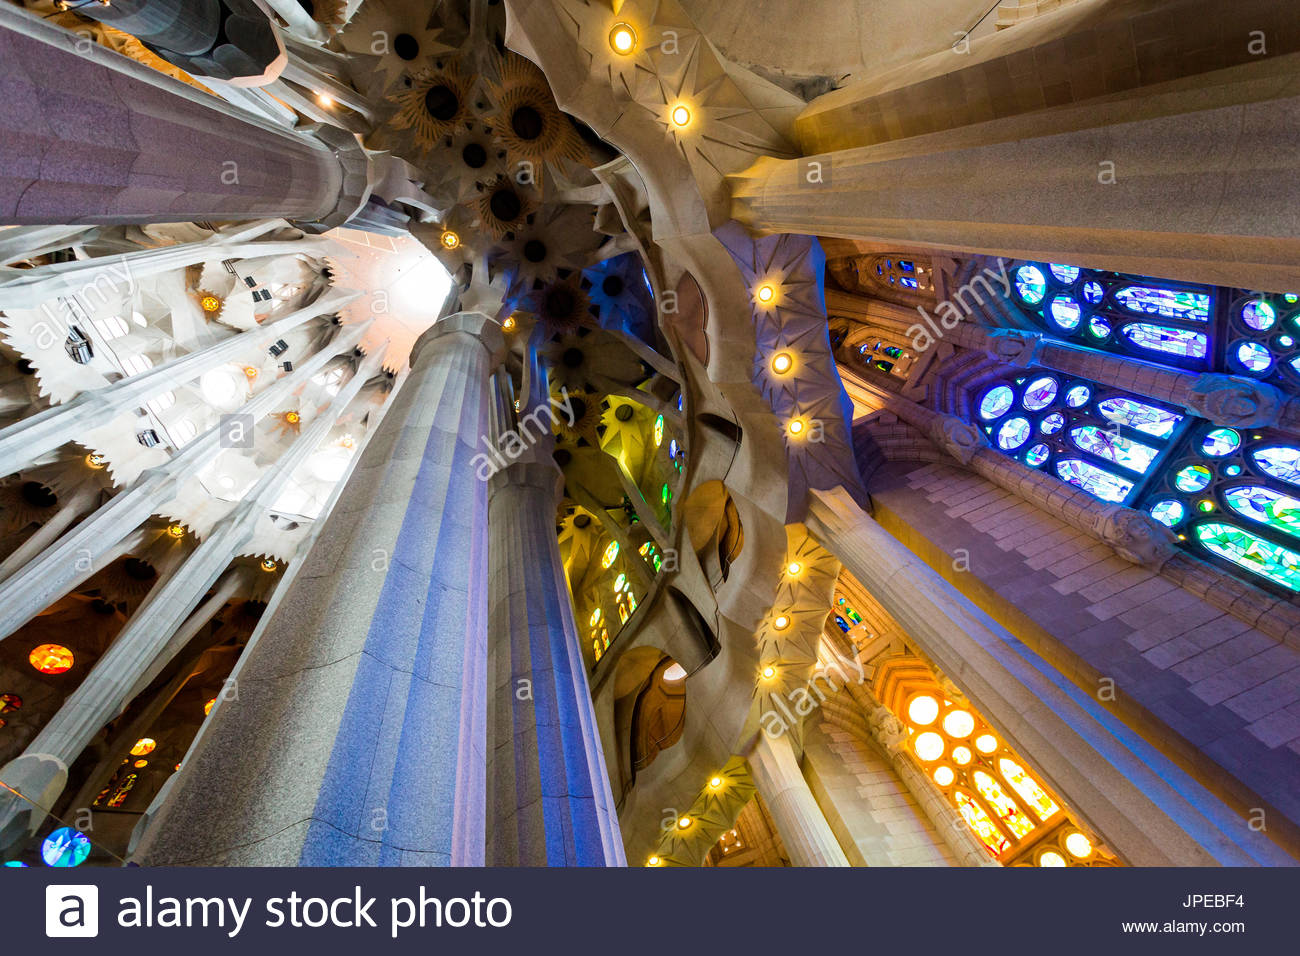 Sagrada Familia interior, building ideated by modernist architect Antonio  Gaudi